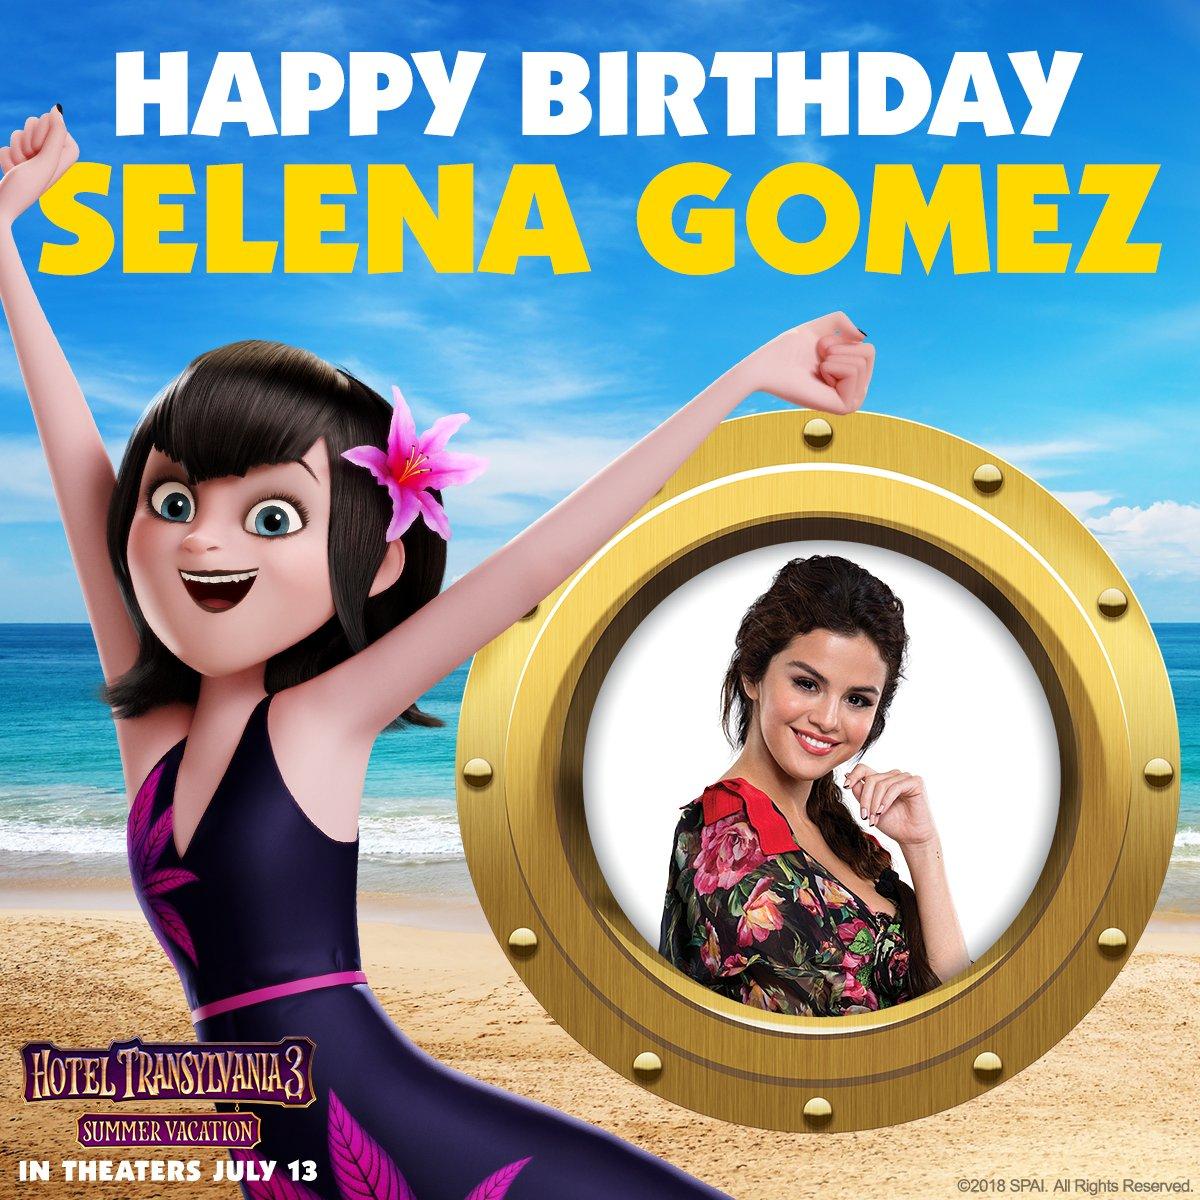 Join us in wishing #HotelT3's @SelenaGomez a happy birthday! �� https://t.co/gaAkijNepo